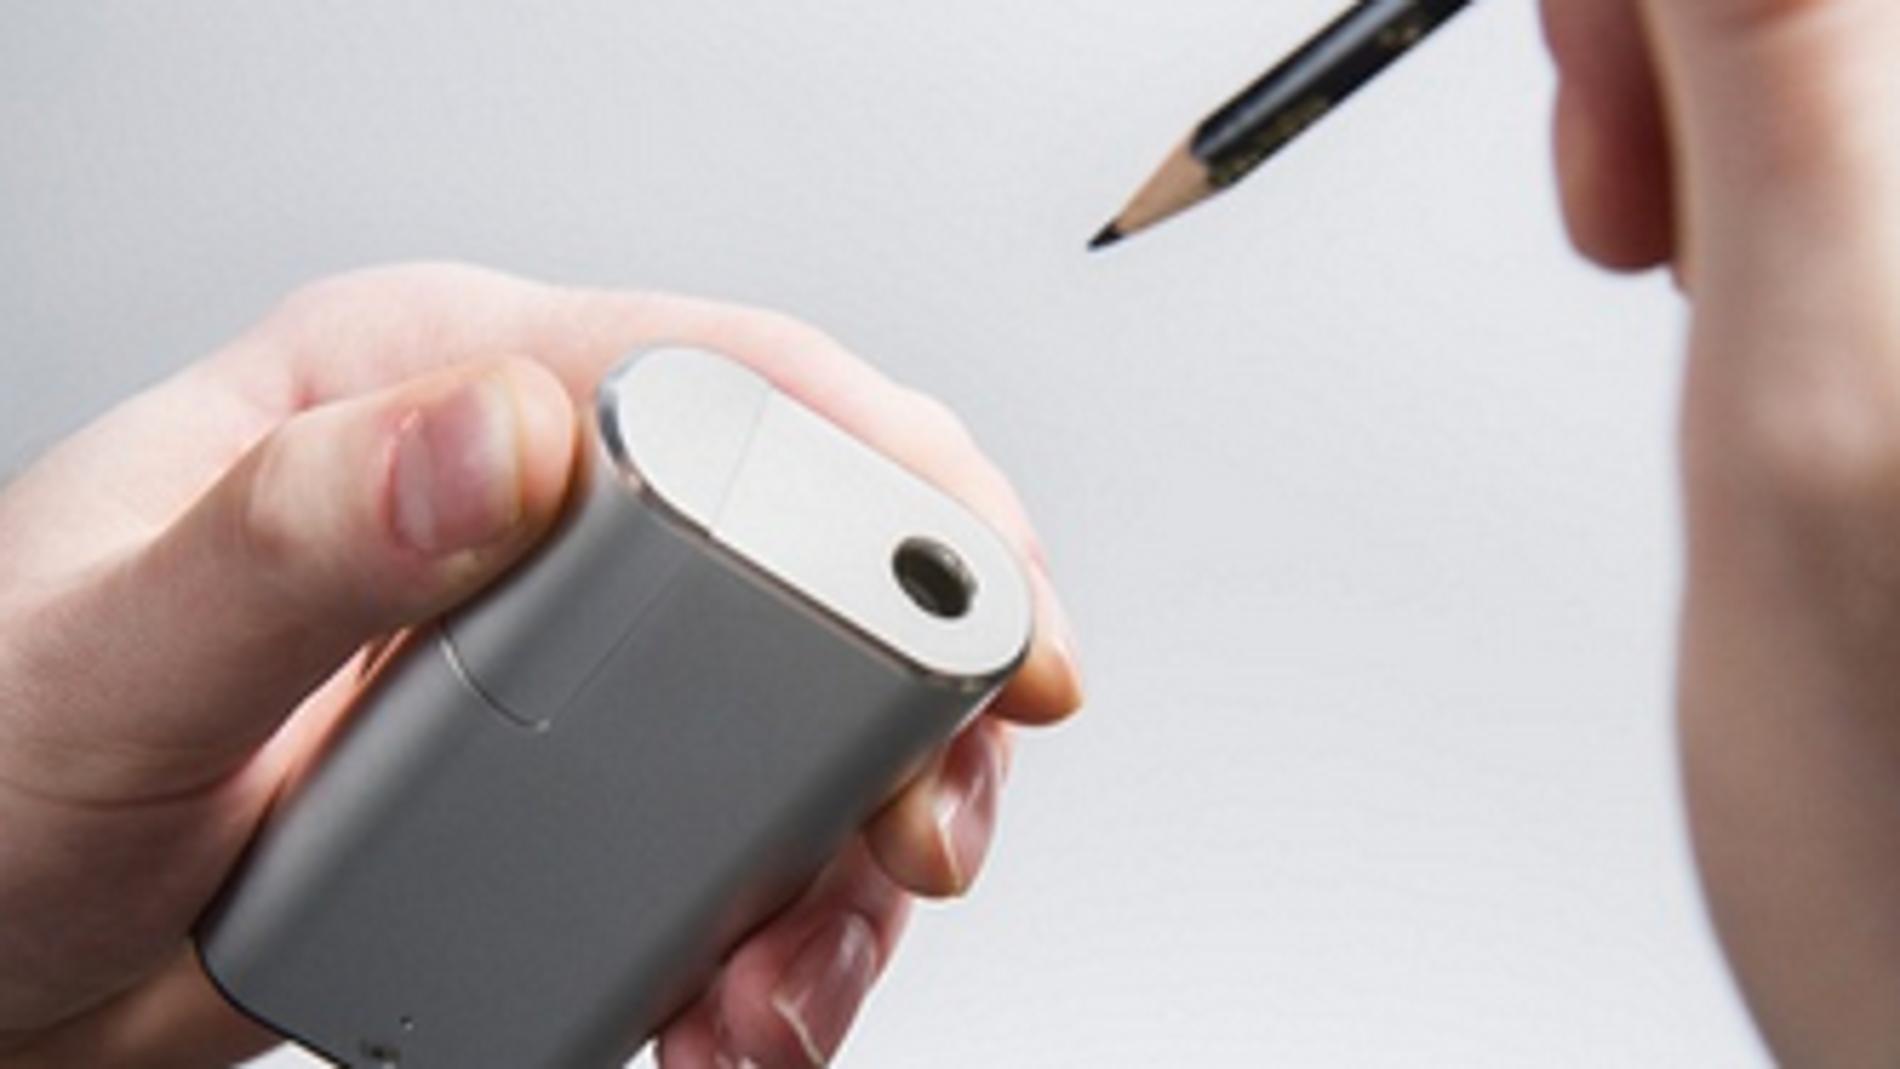 iDraw, un sacapuntas que se carga via USB